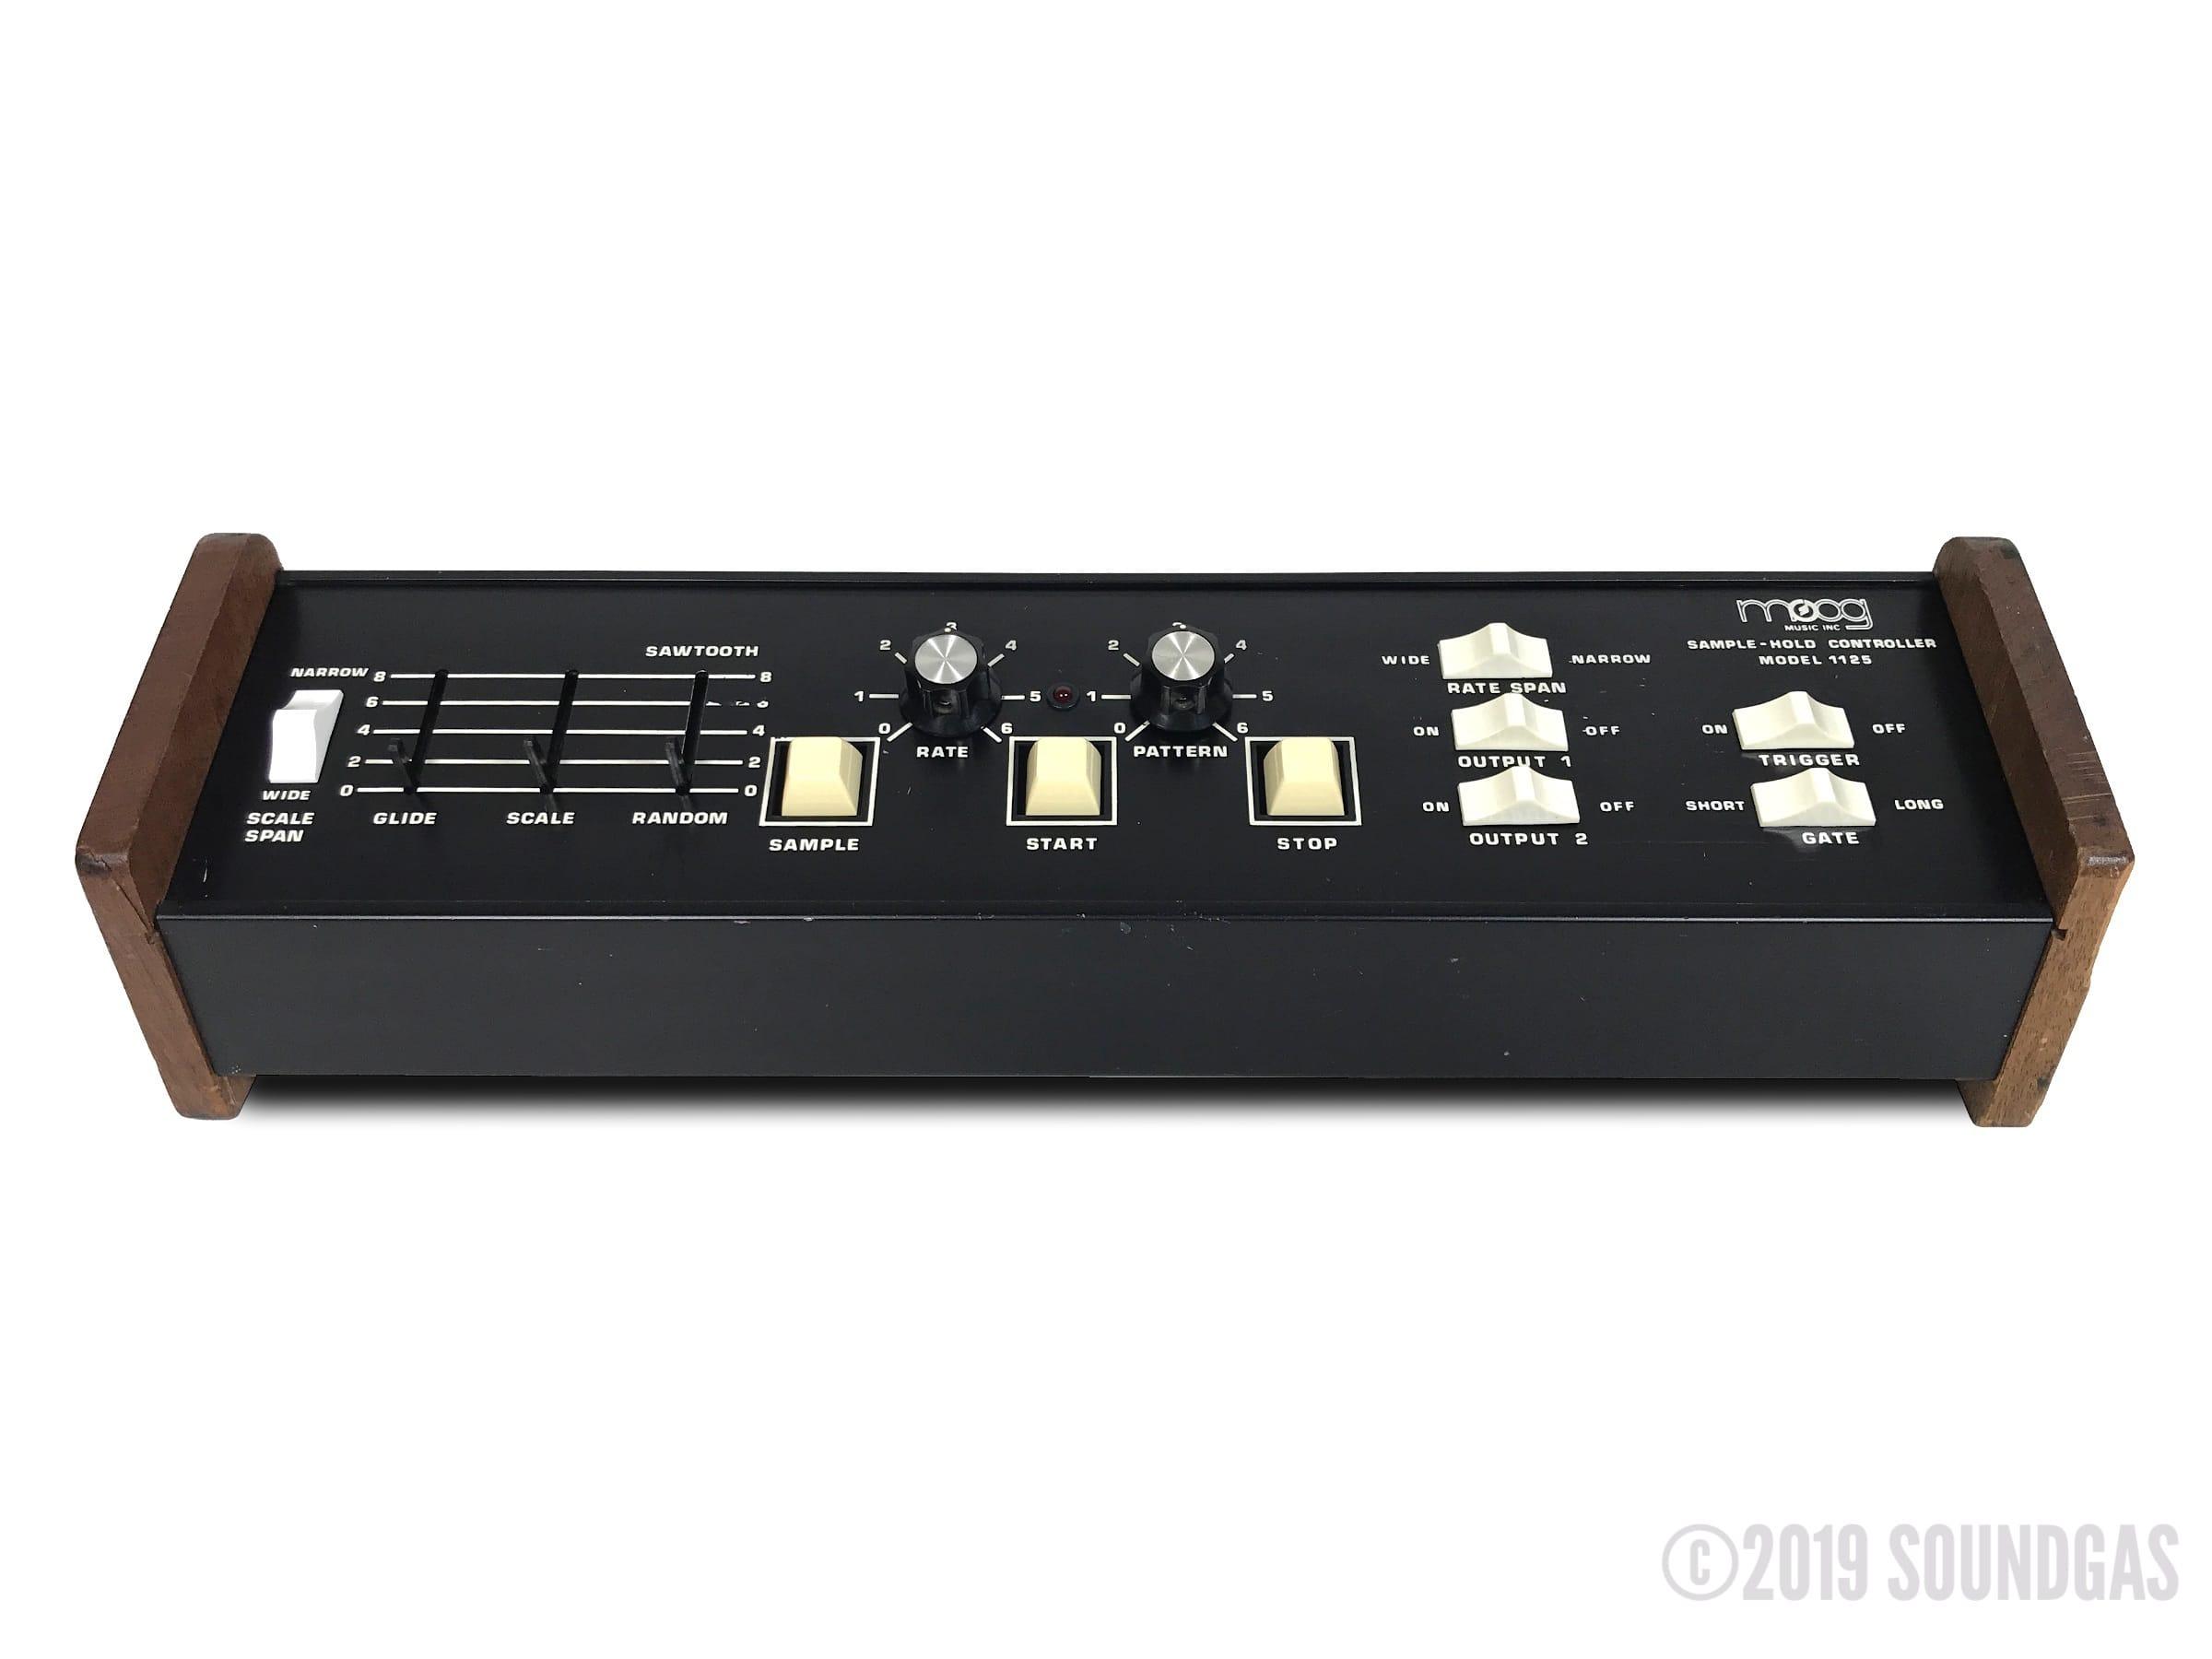 Moog Sample-Hold Controller Model 1125